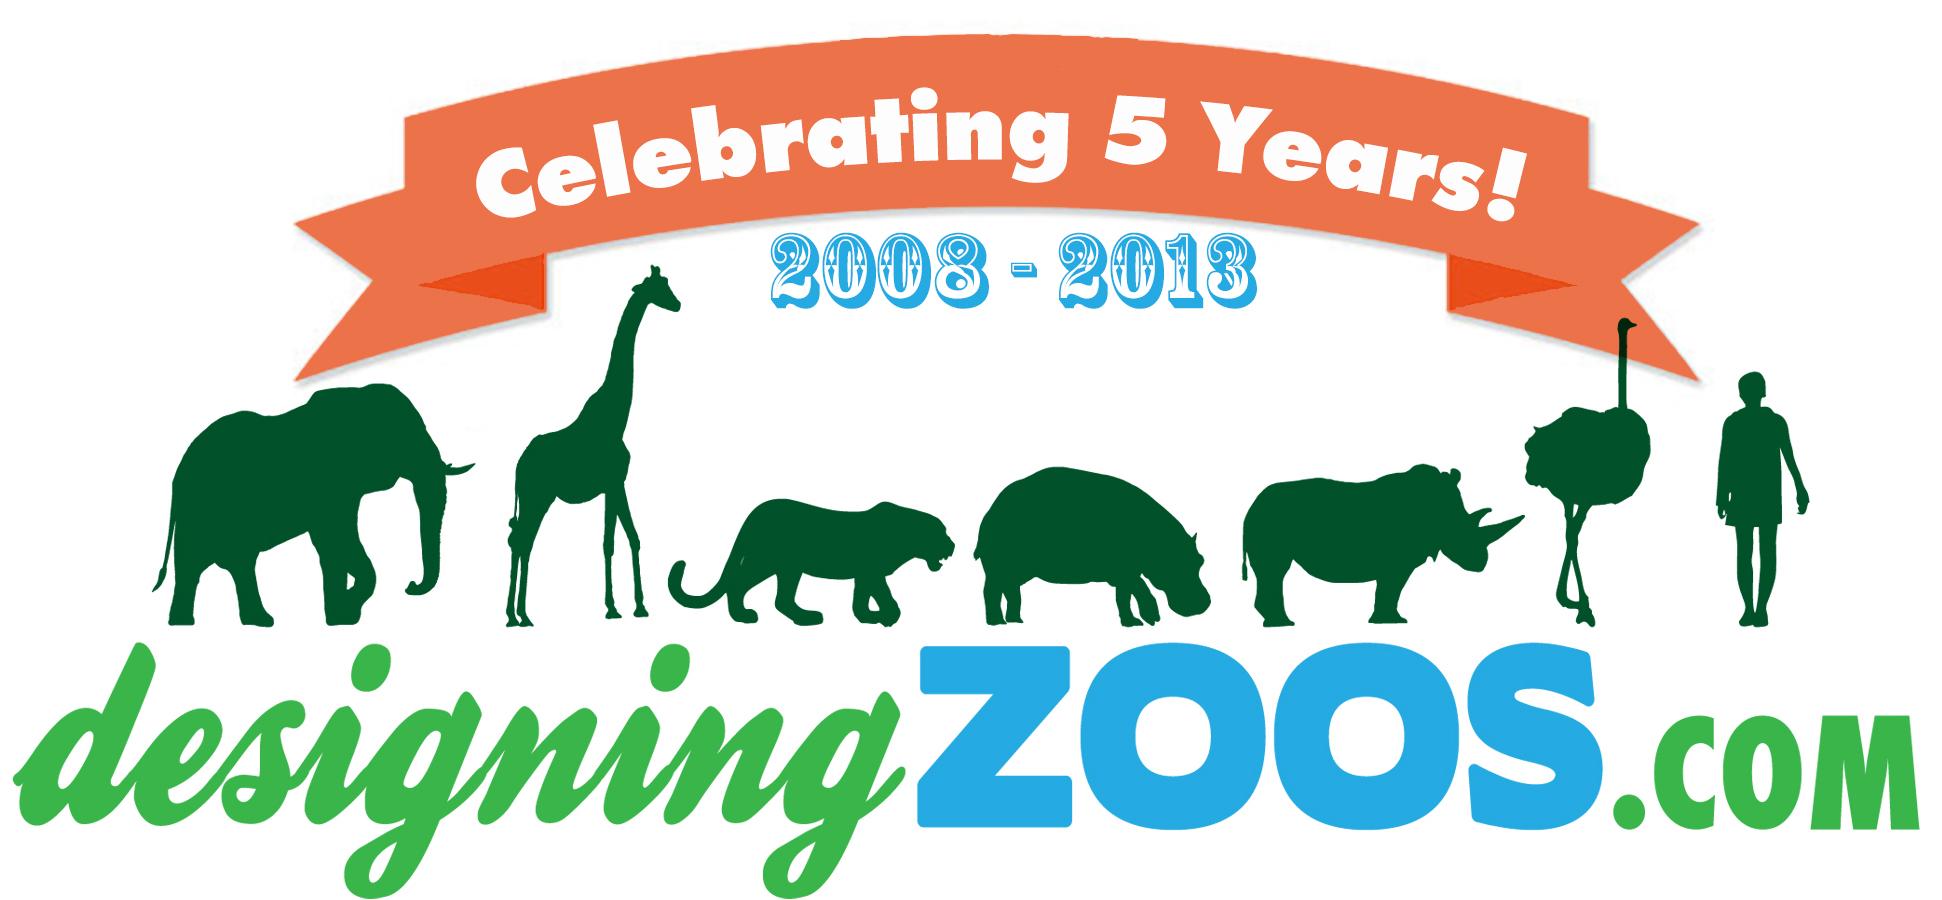 Happy th anniversary designing zoos